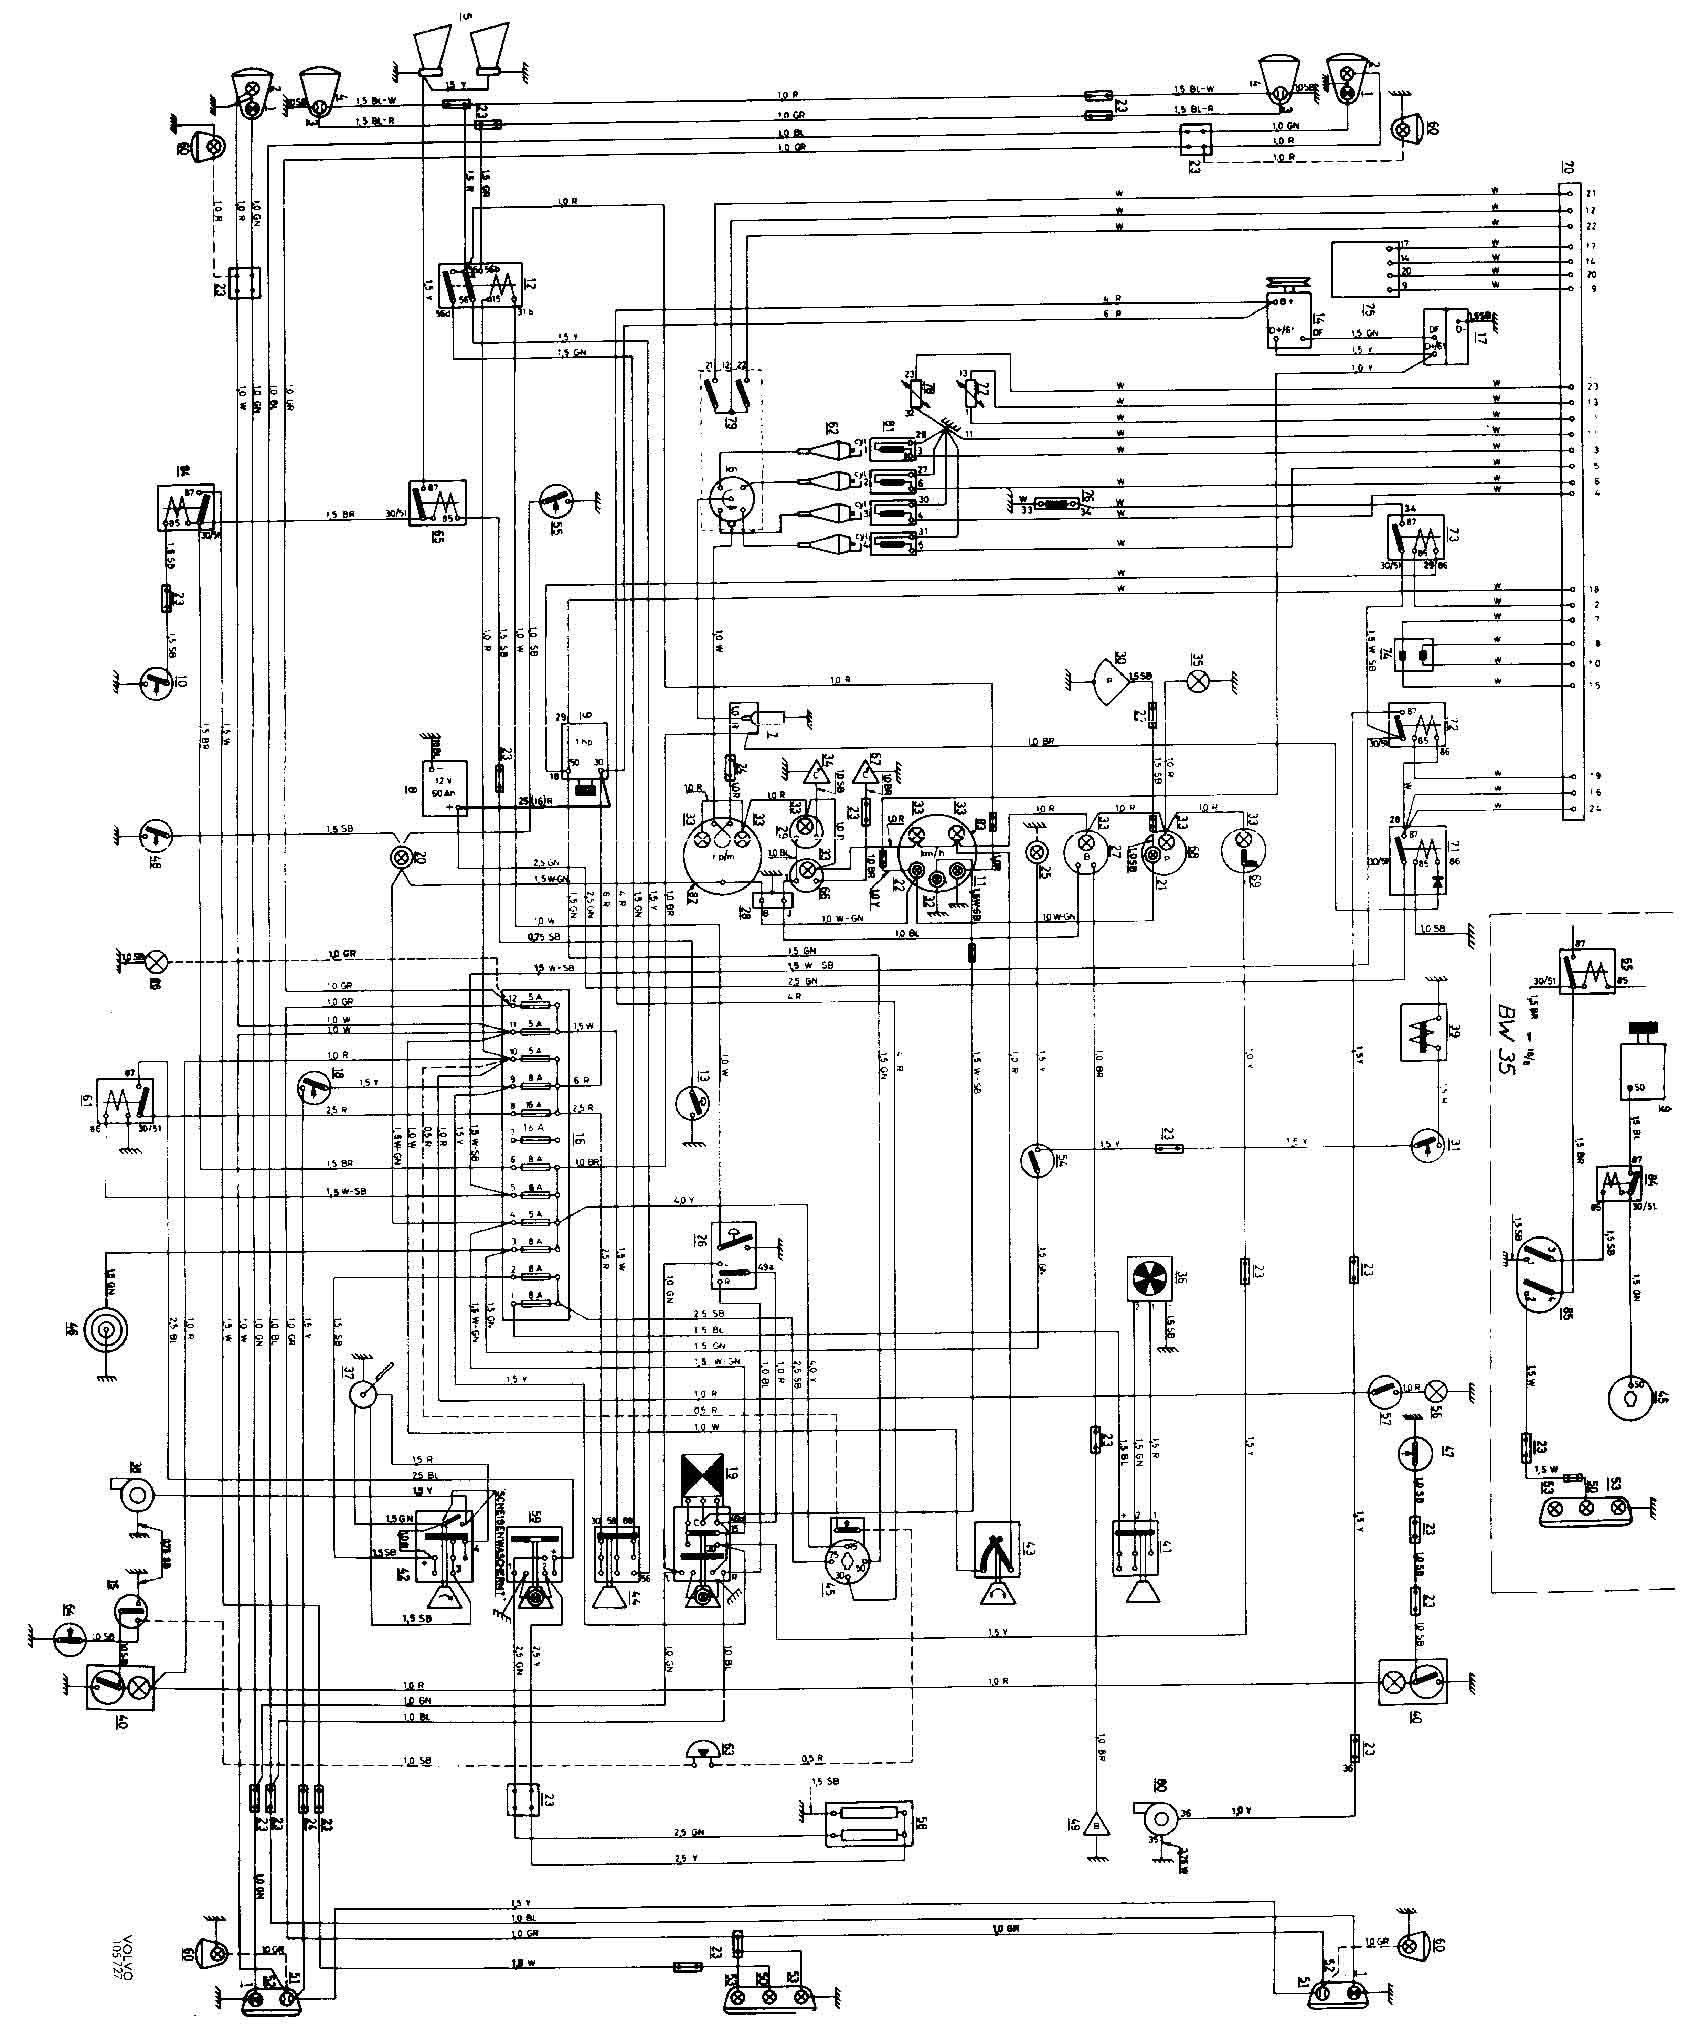 Stero Dishwasher Wiring Diagrams Caroldoey Wire Data Schema Merco Diagram Amana